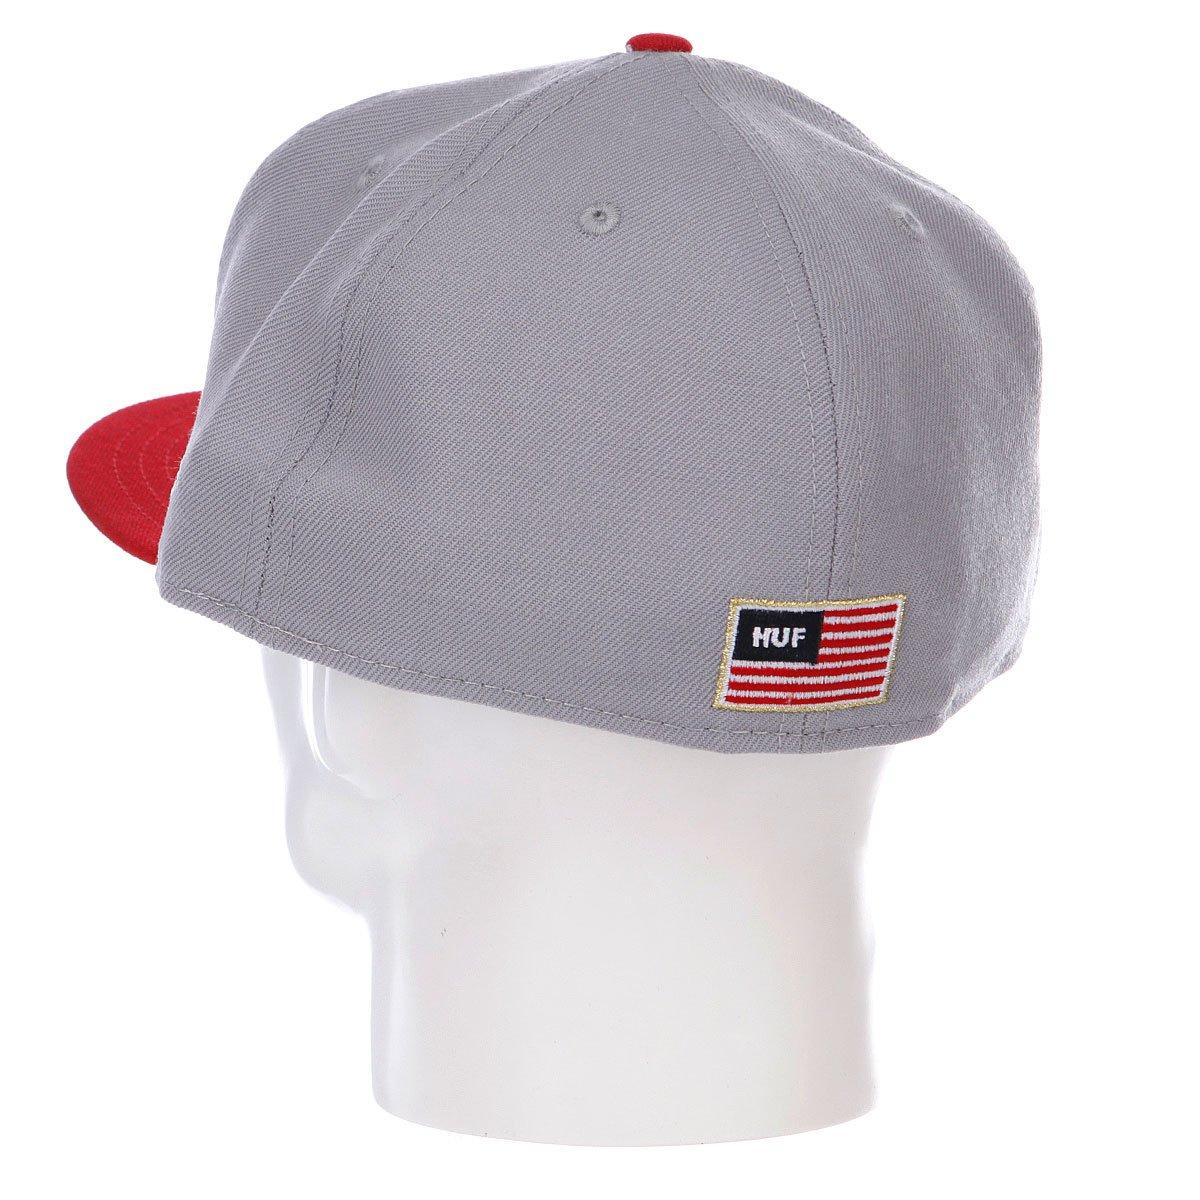 Бейсболка New Era Huf Usa NewEra Gray/Red